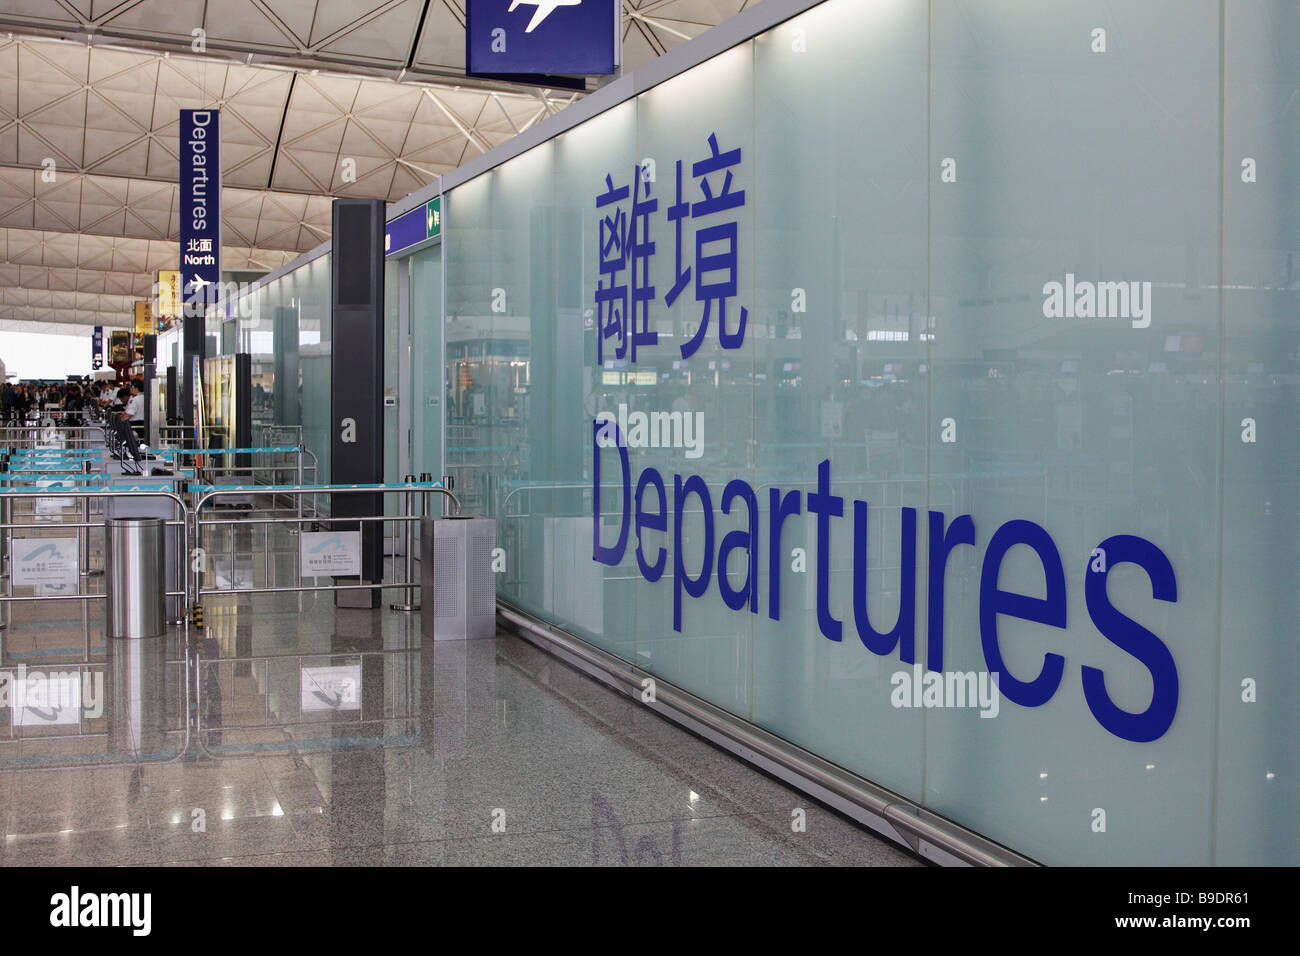 Departure Lounge, Chek Lap Kok International Airport, Hong Kong Stock Photo